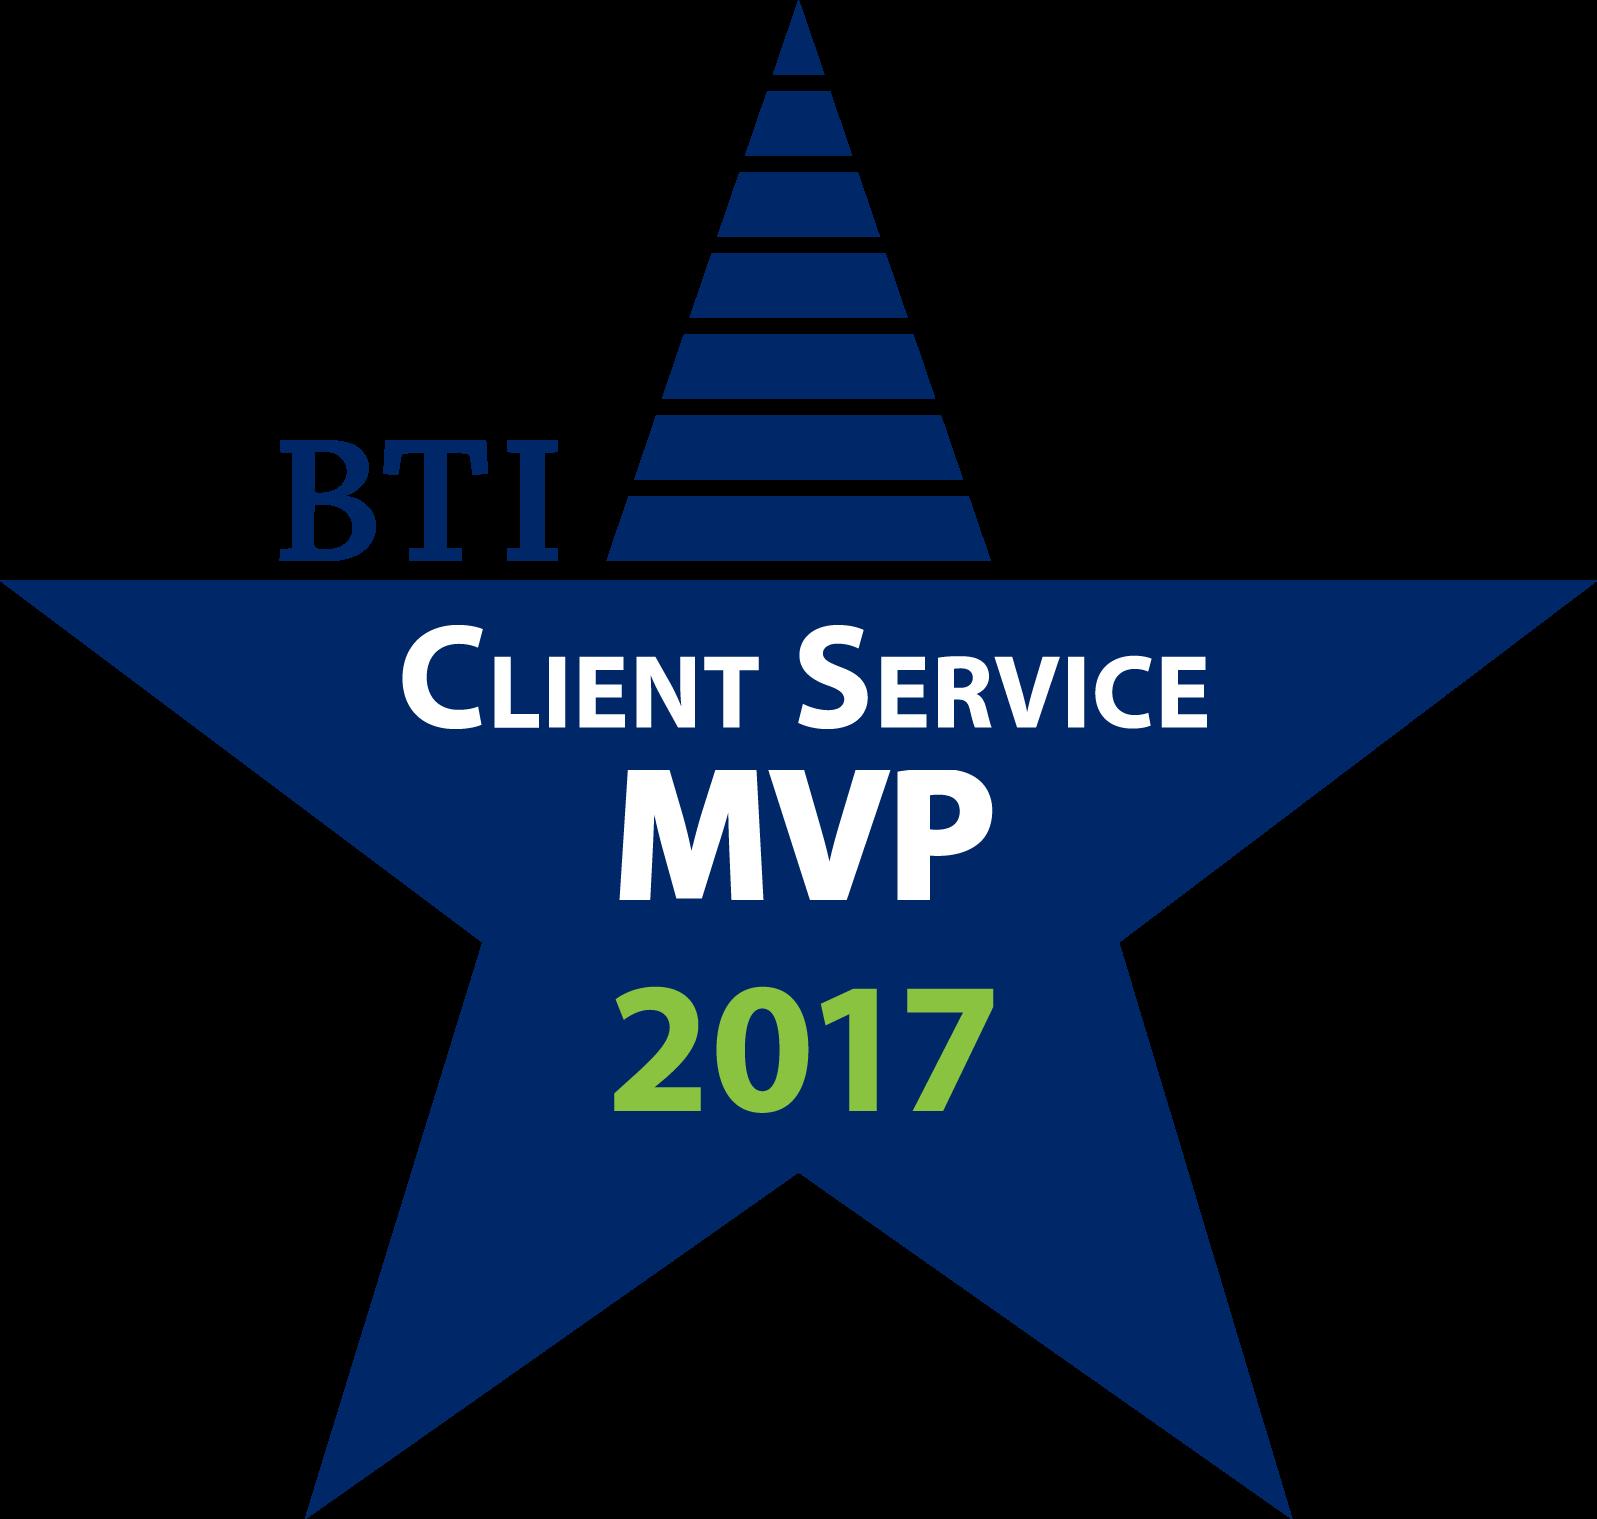 BTI Client Service All Star MVP 2017